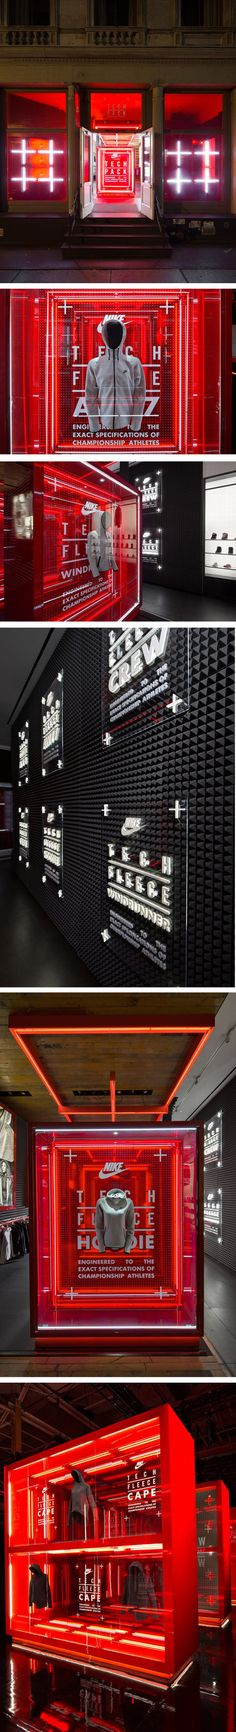 Nike flagship store by Nike & WeShouldDoItAll & Corey Yurkovich, New York City.